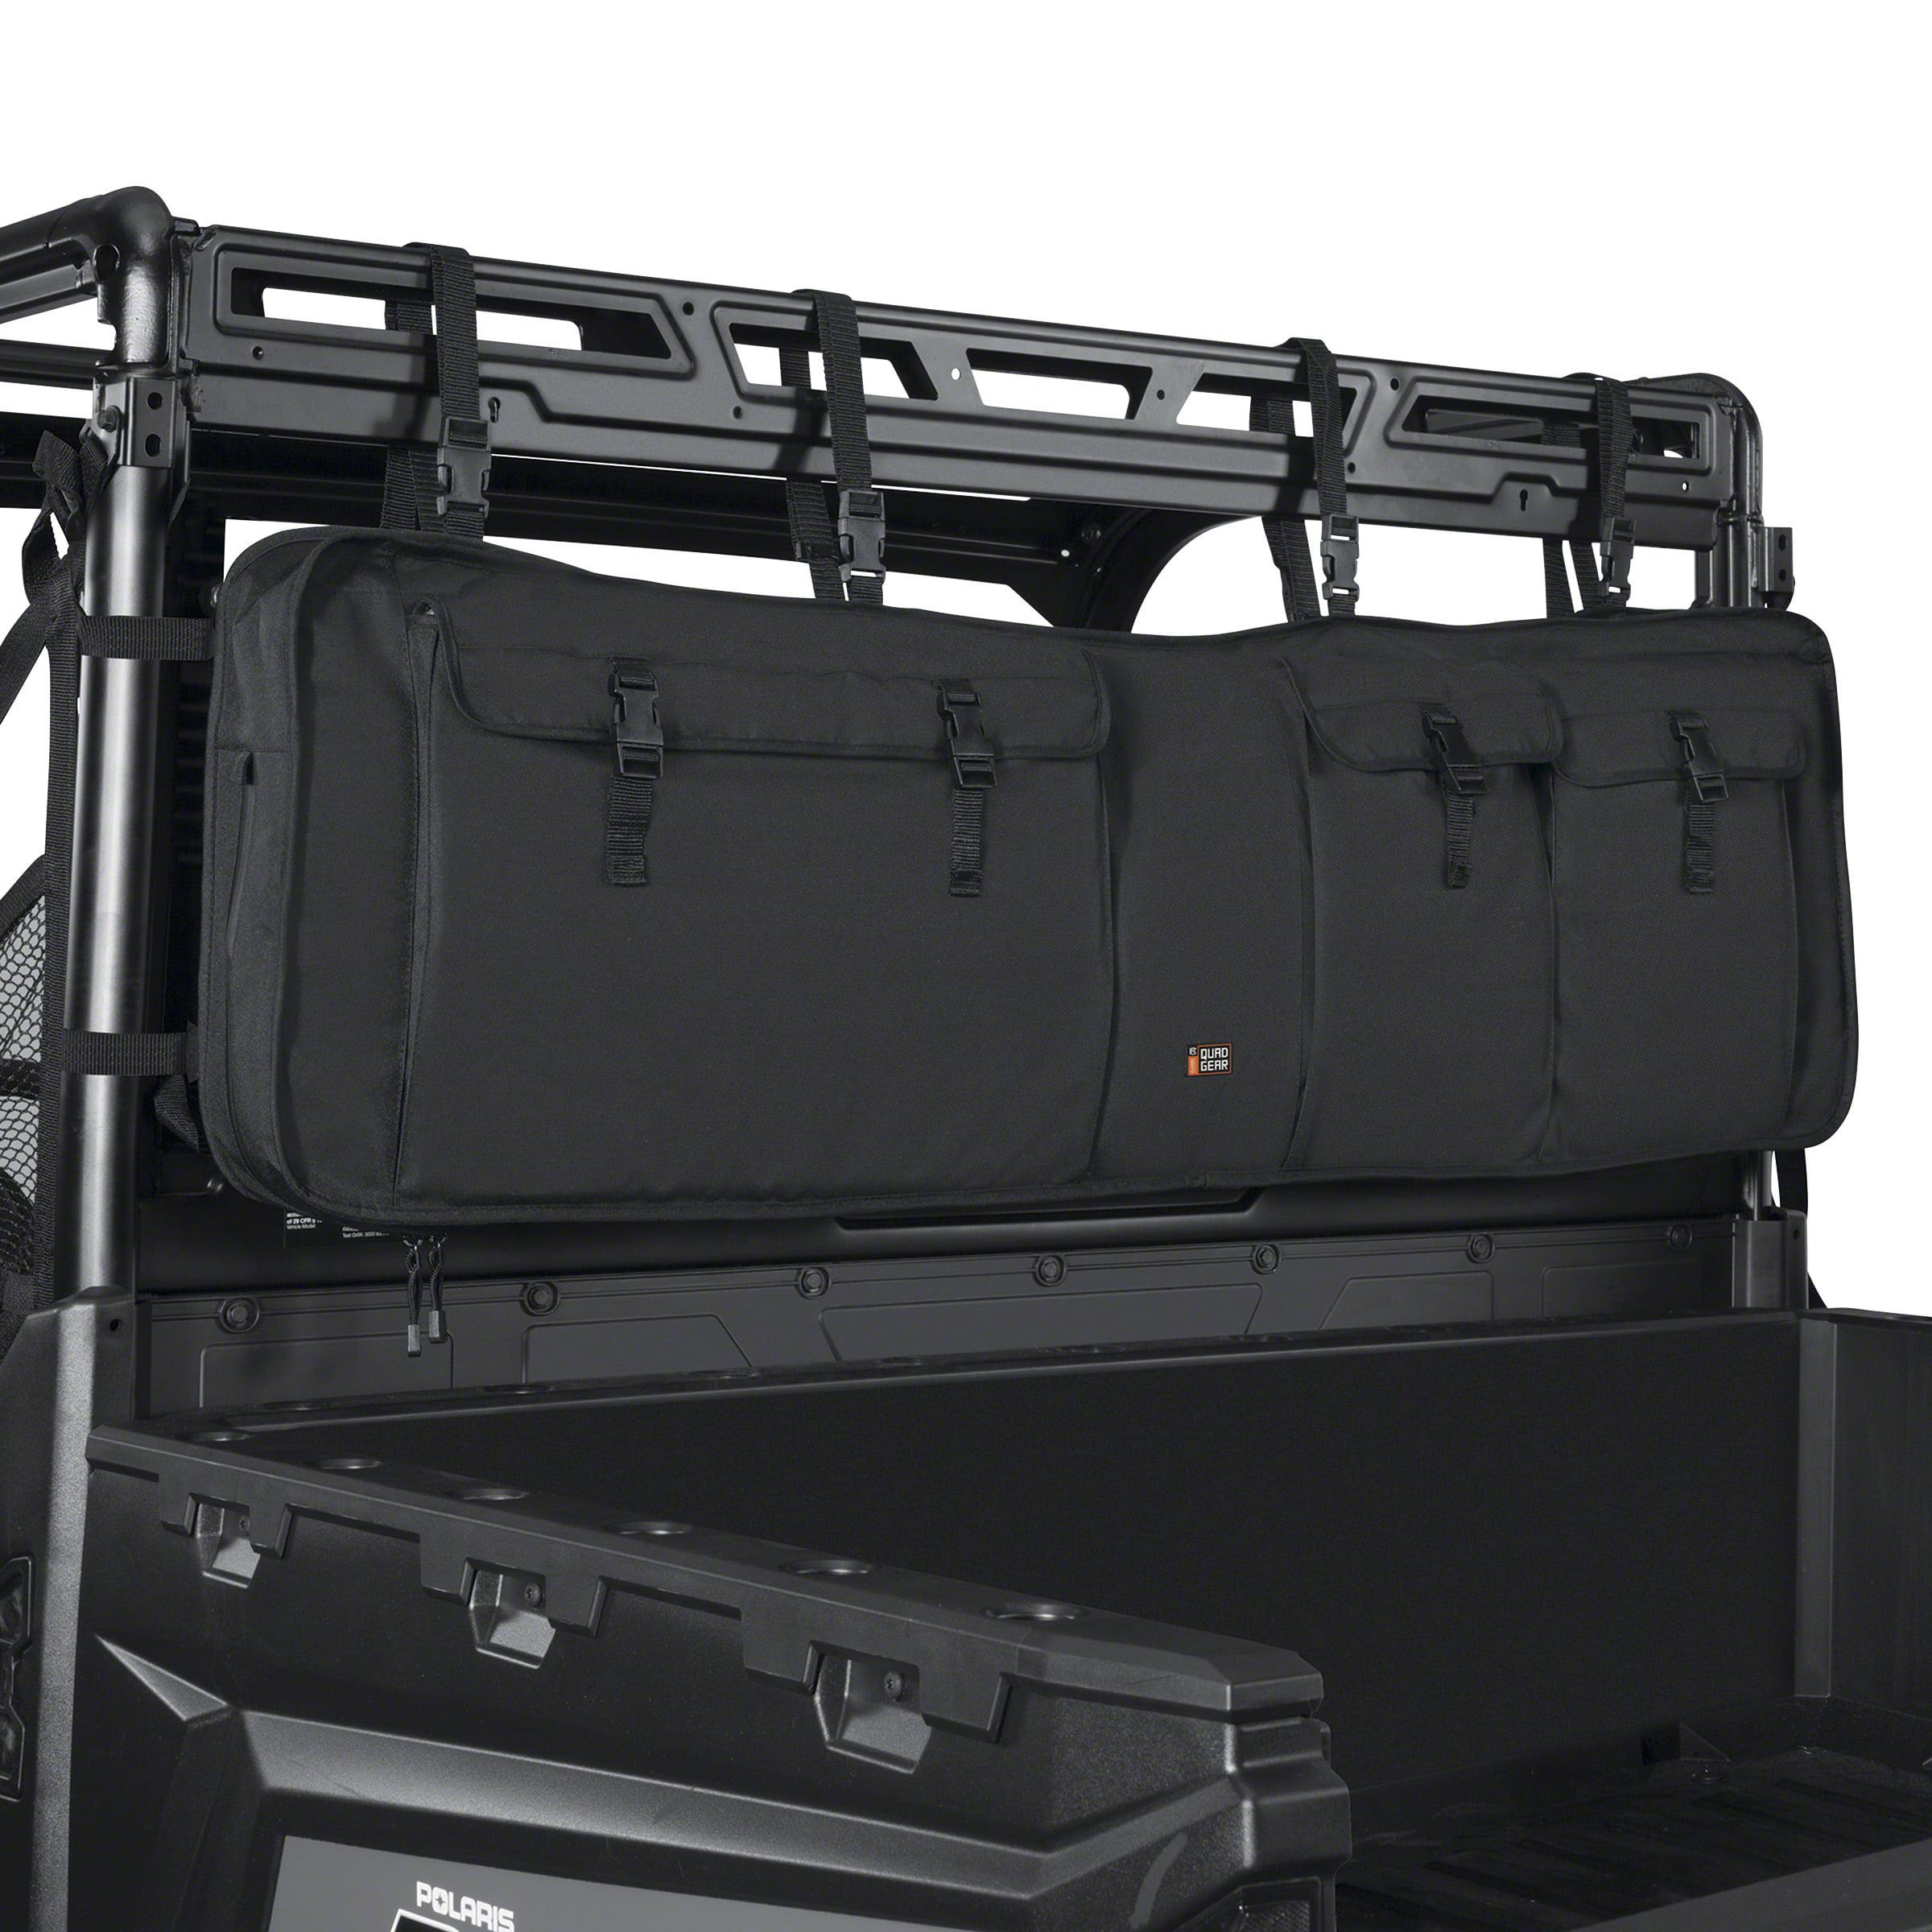 Classic Accessories QuadGear UTV Double Gun Carrier, Black